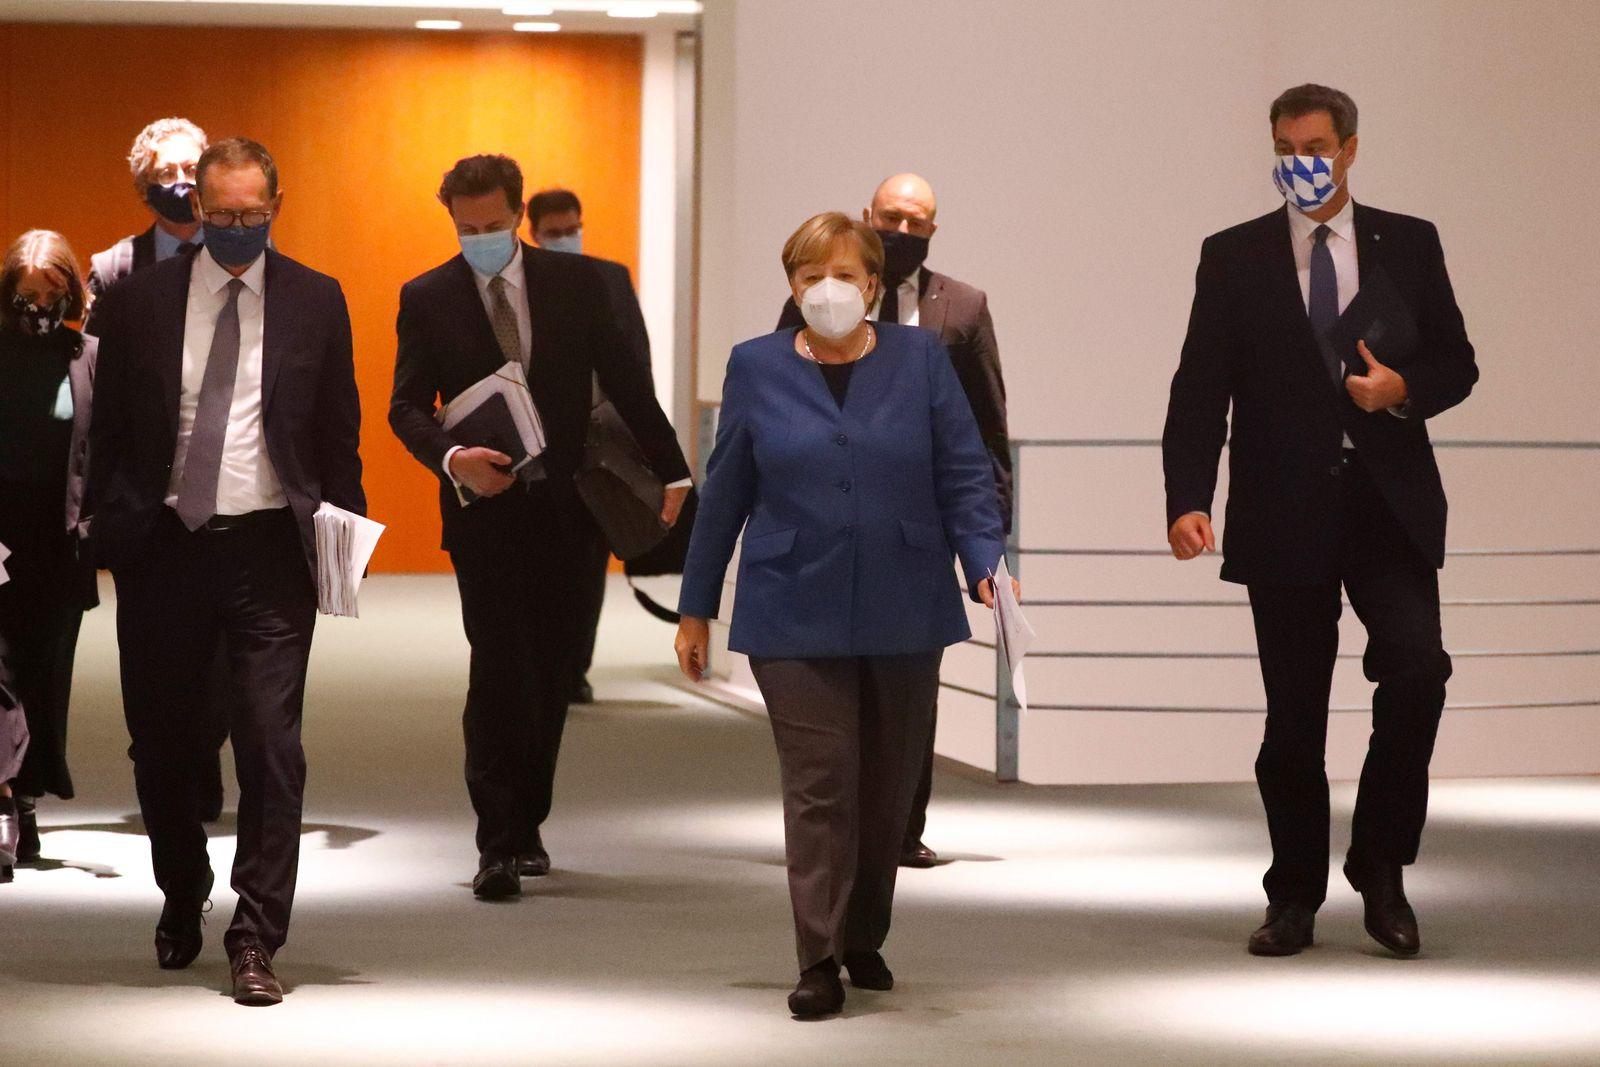 German Chancellor Angela Merkel attends a video-conference